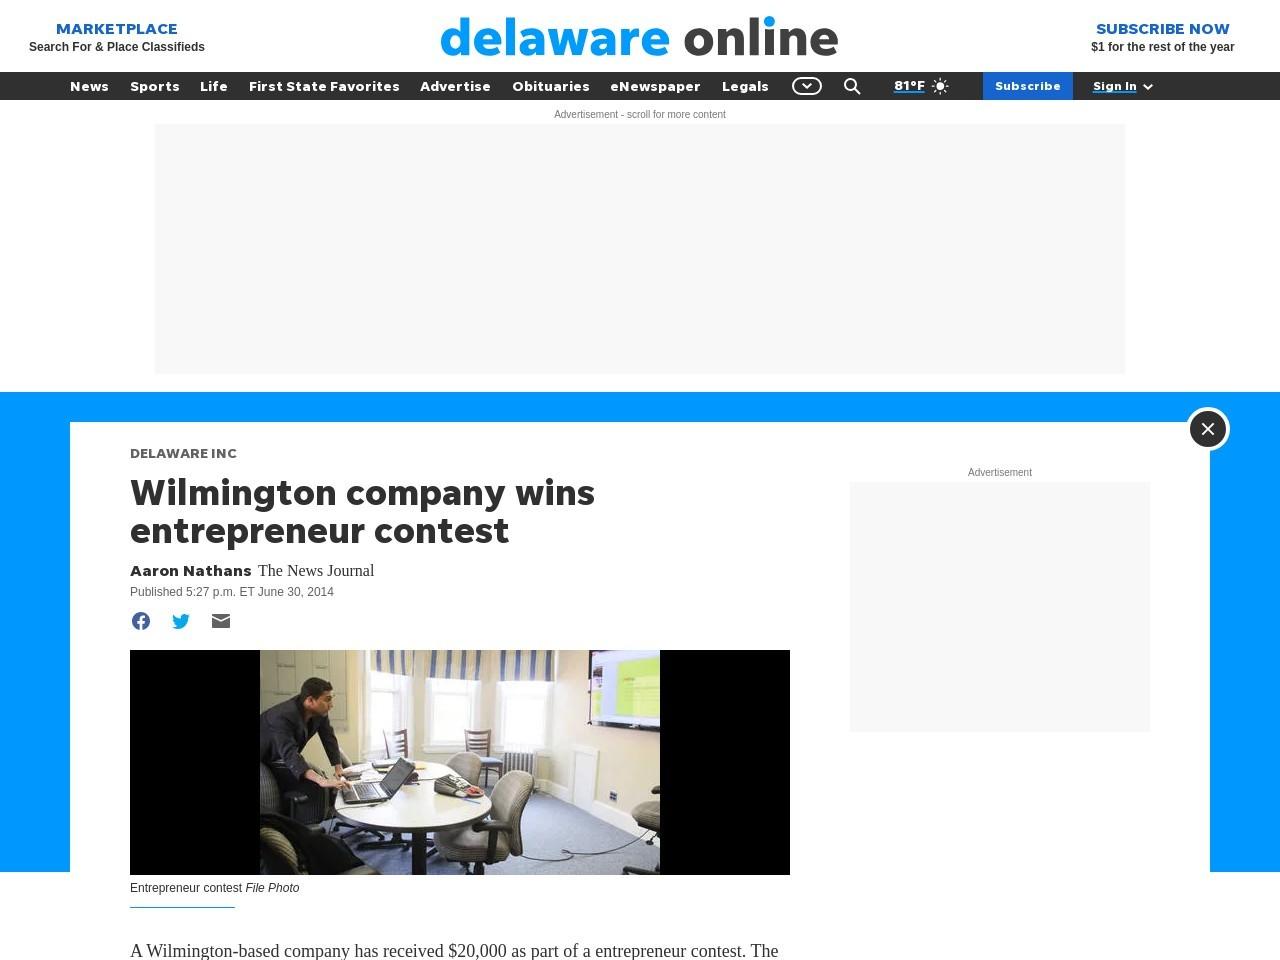 Wilmington company wins entrepreneur contest